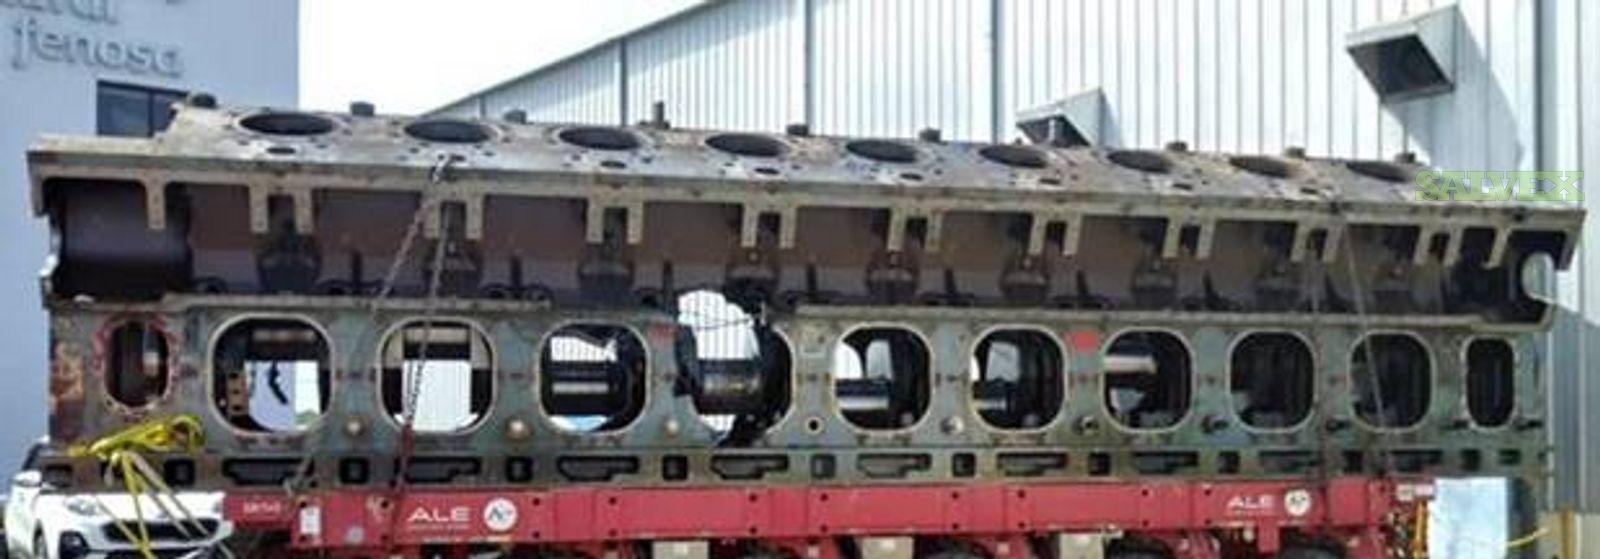 MAN V 48/60  Power Plant Engine- Damaged